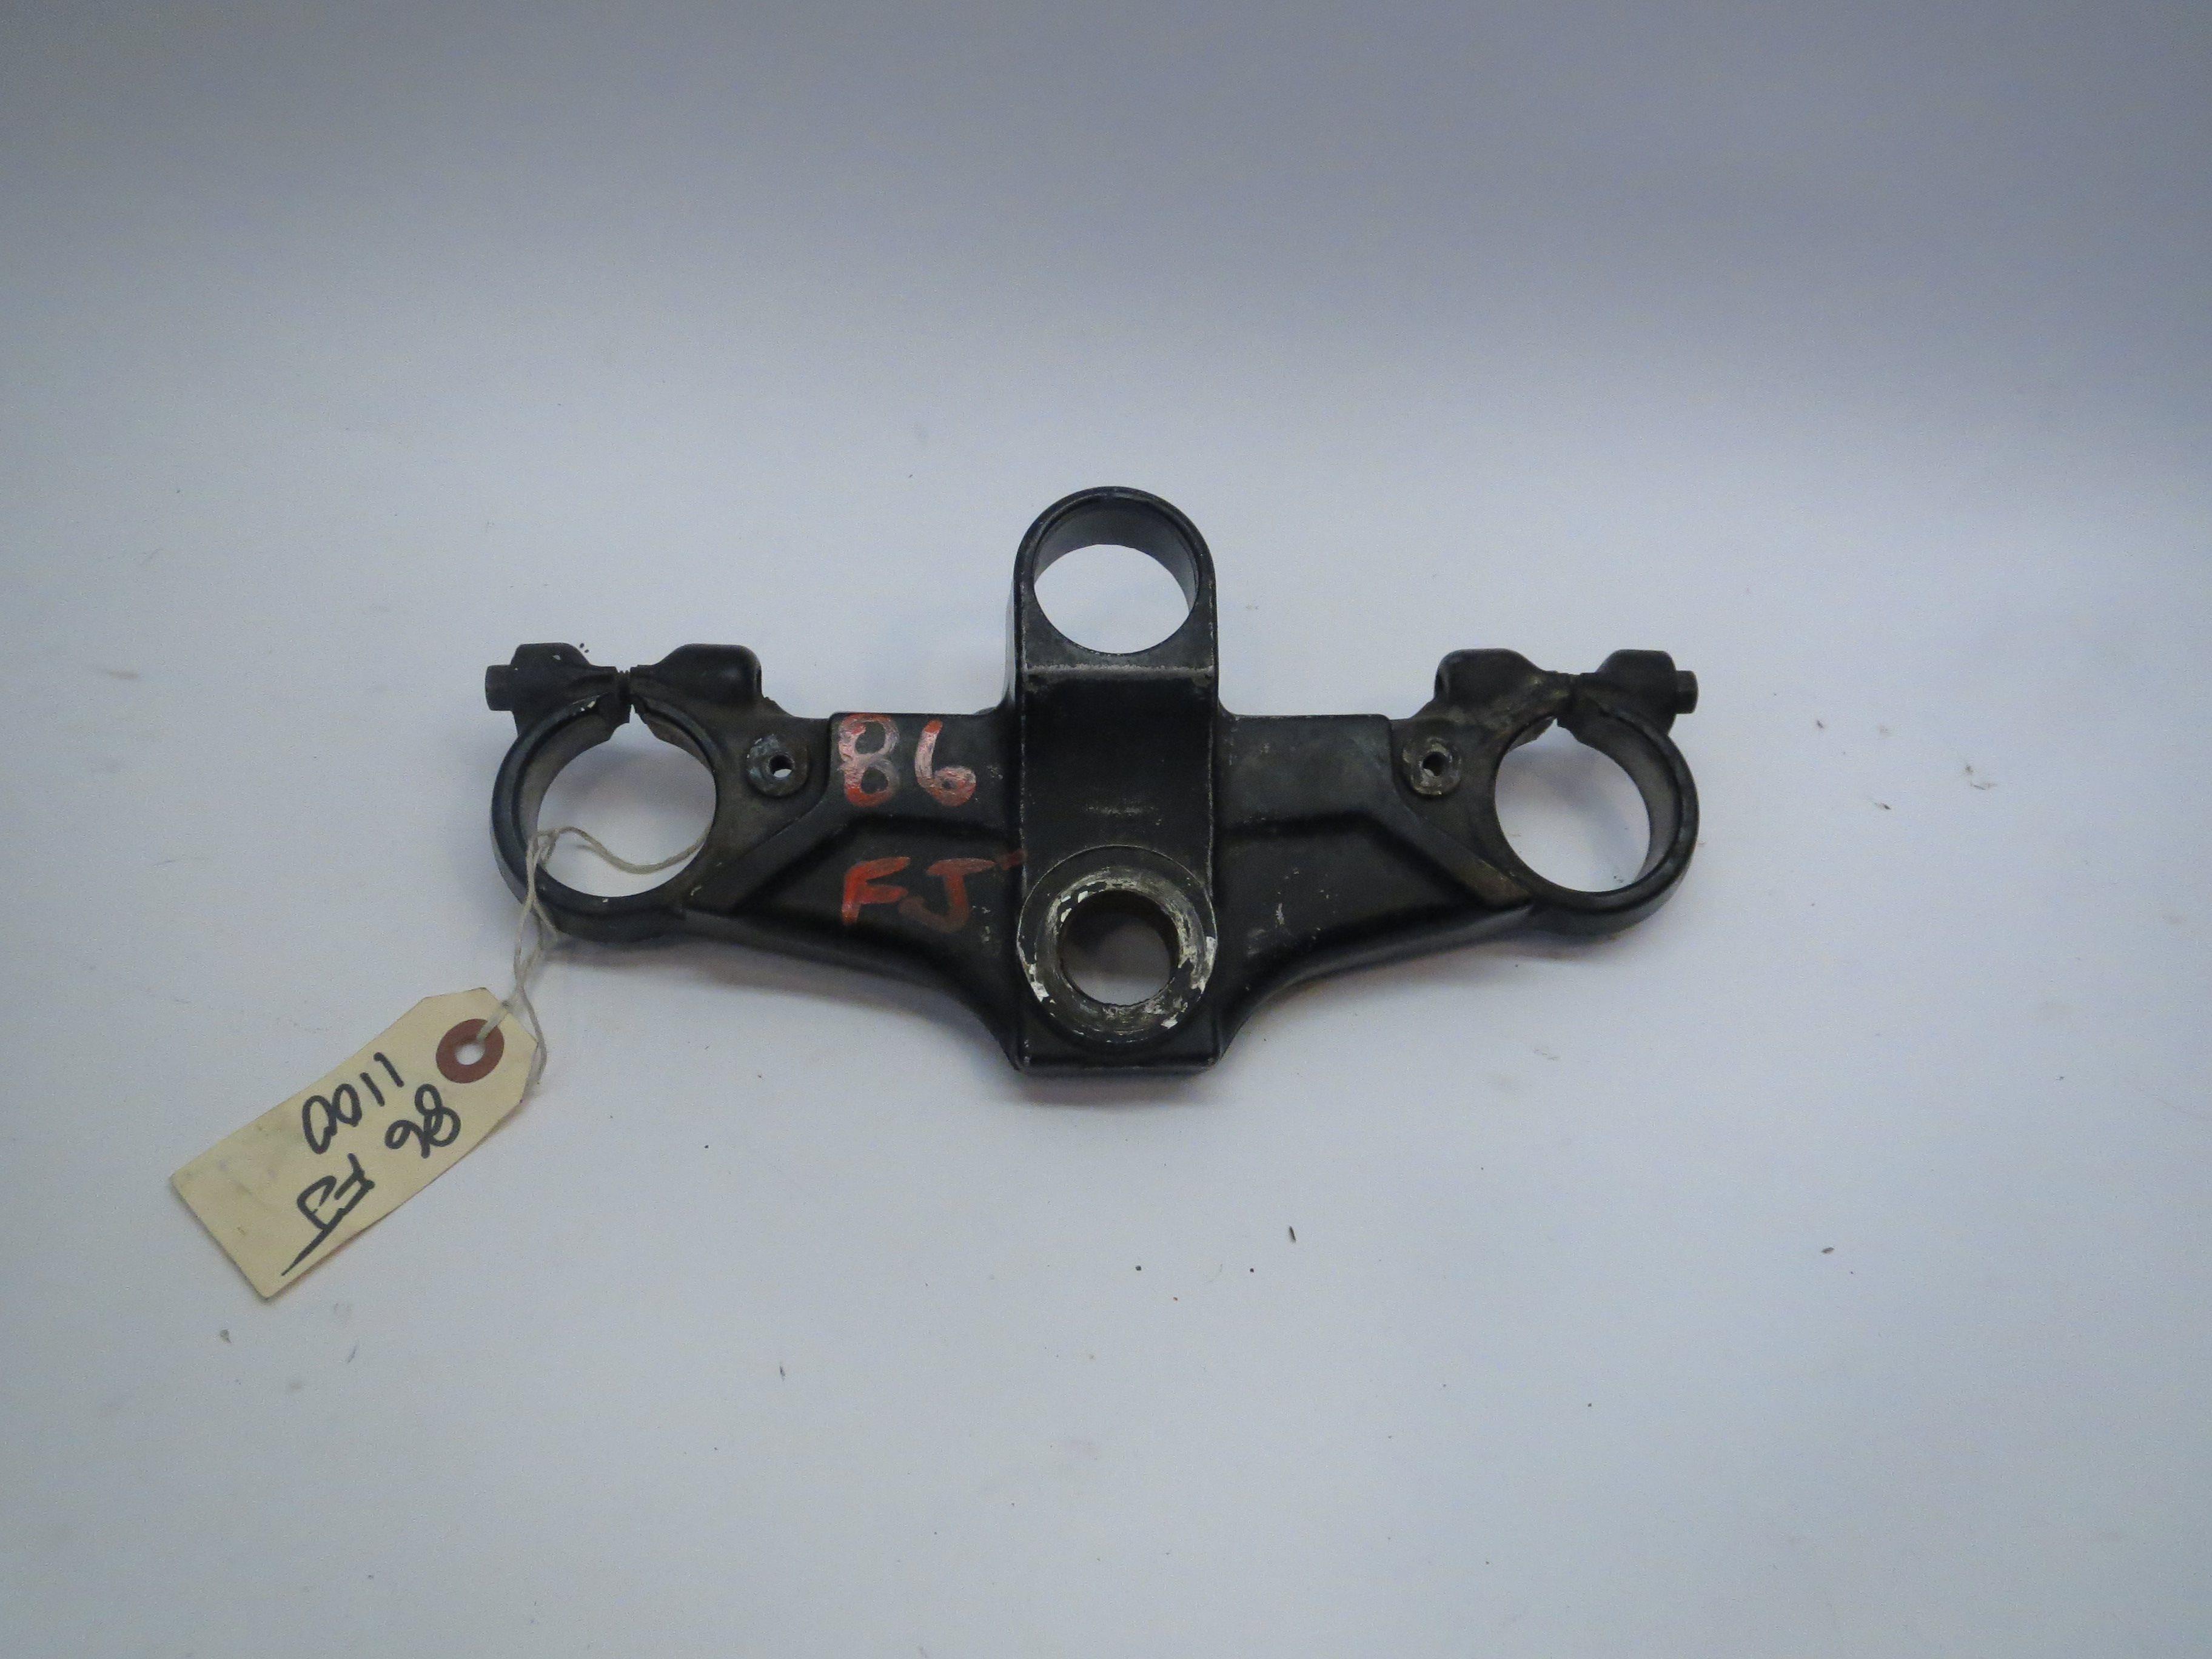 Kr Ignition Switch For Yamaha Fj 1100 Fj 1200 Sr 250 Se Xv 500 ...